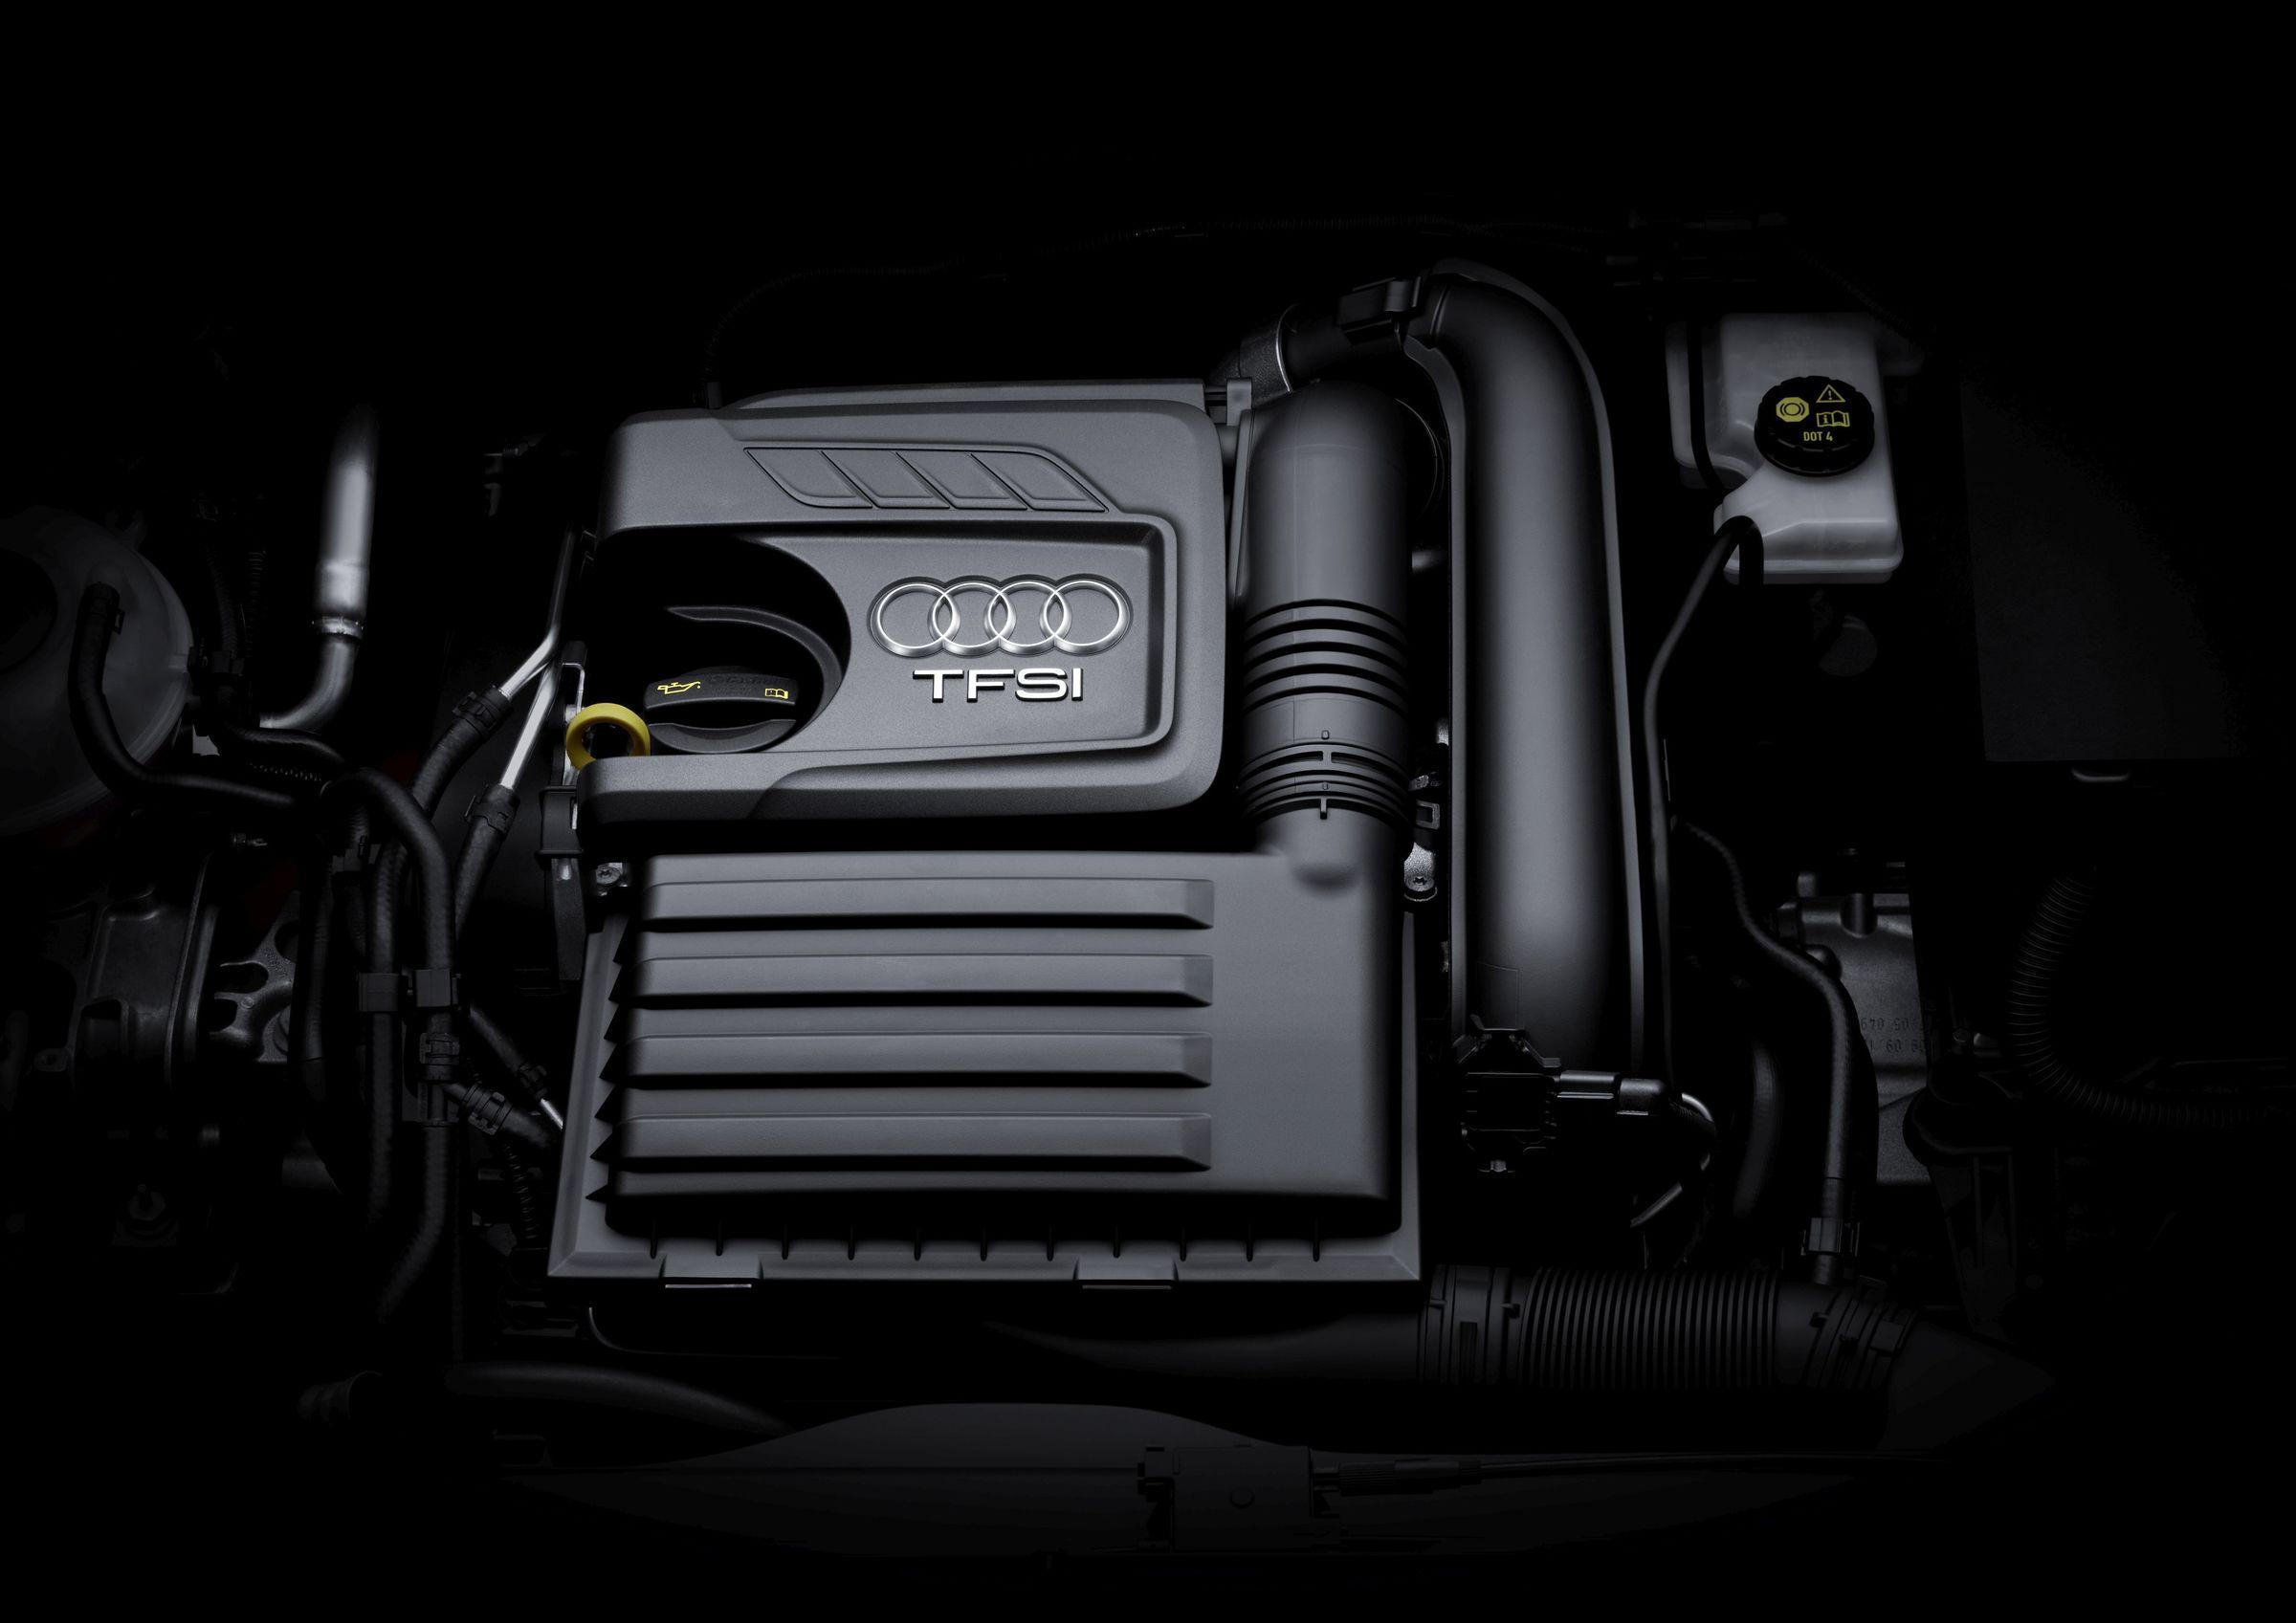 Drive System Audi Mediacenter Trail 70 12v Wiring Diagram Tfsi Engine